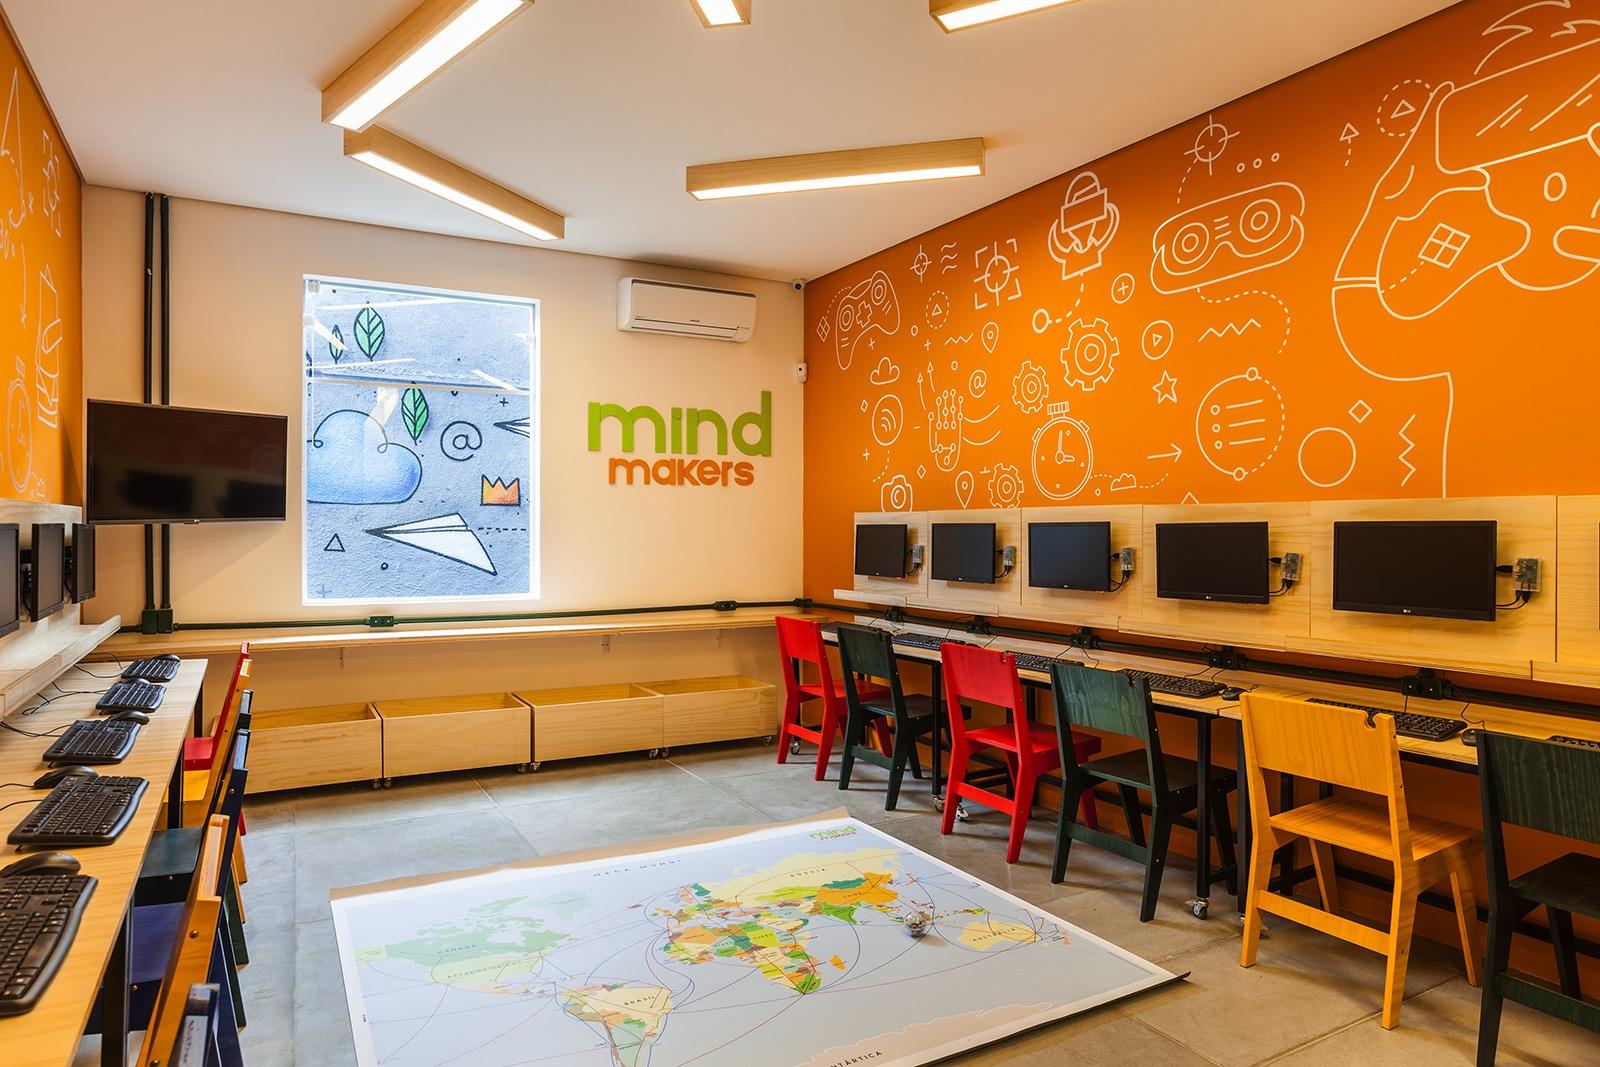 mind-makers-sao-paulo-3